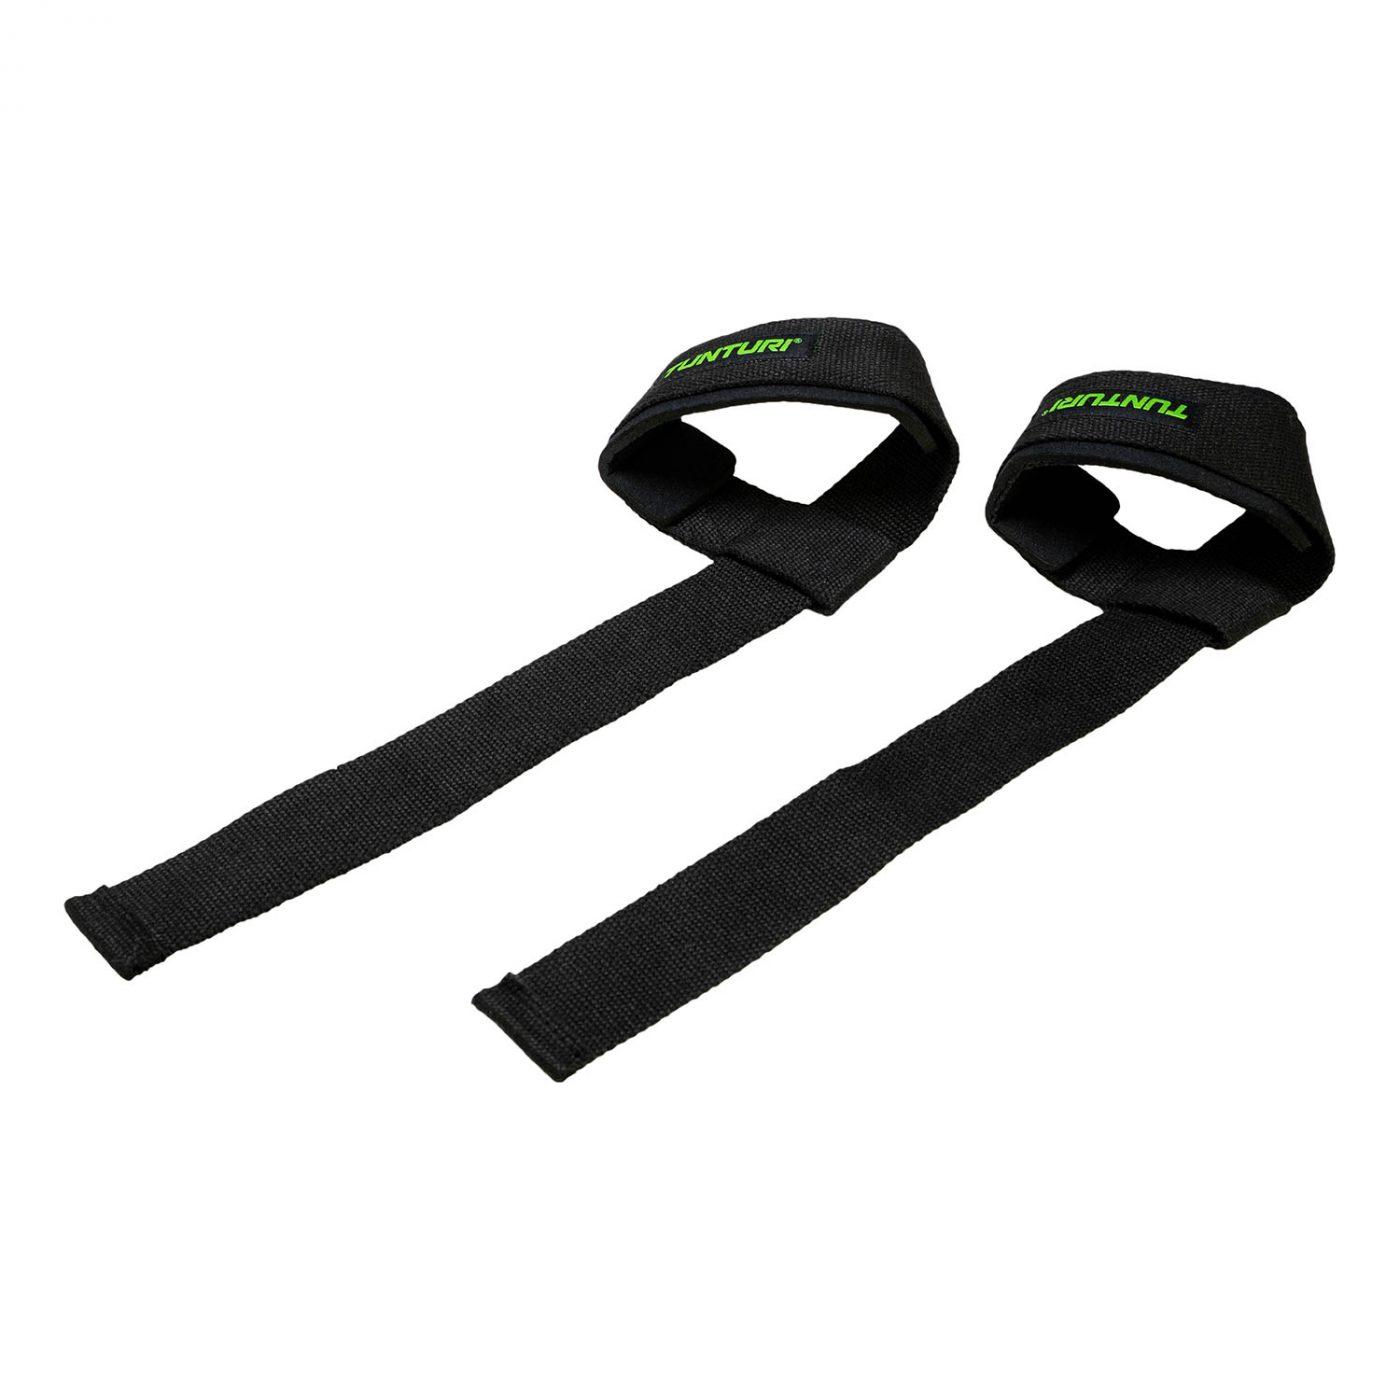 Tunturi Lifting Straps - wrist straps - Padded